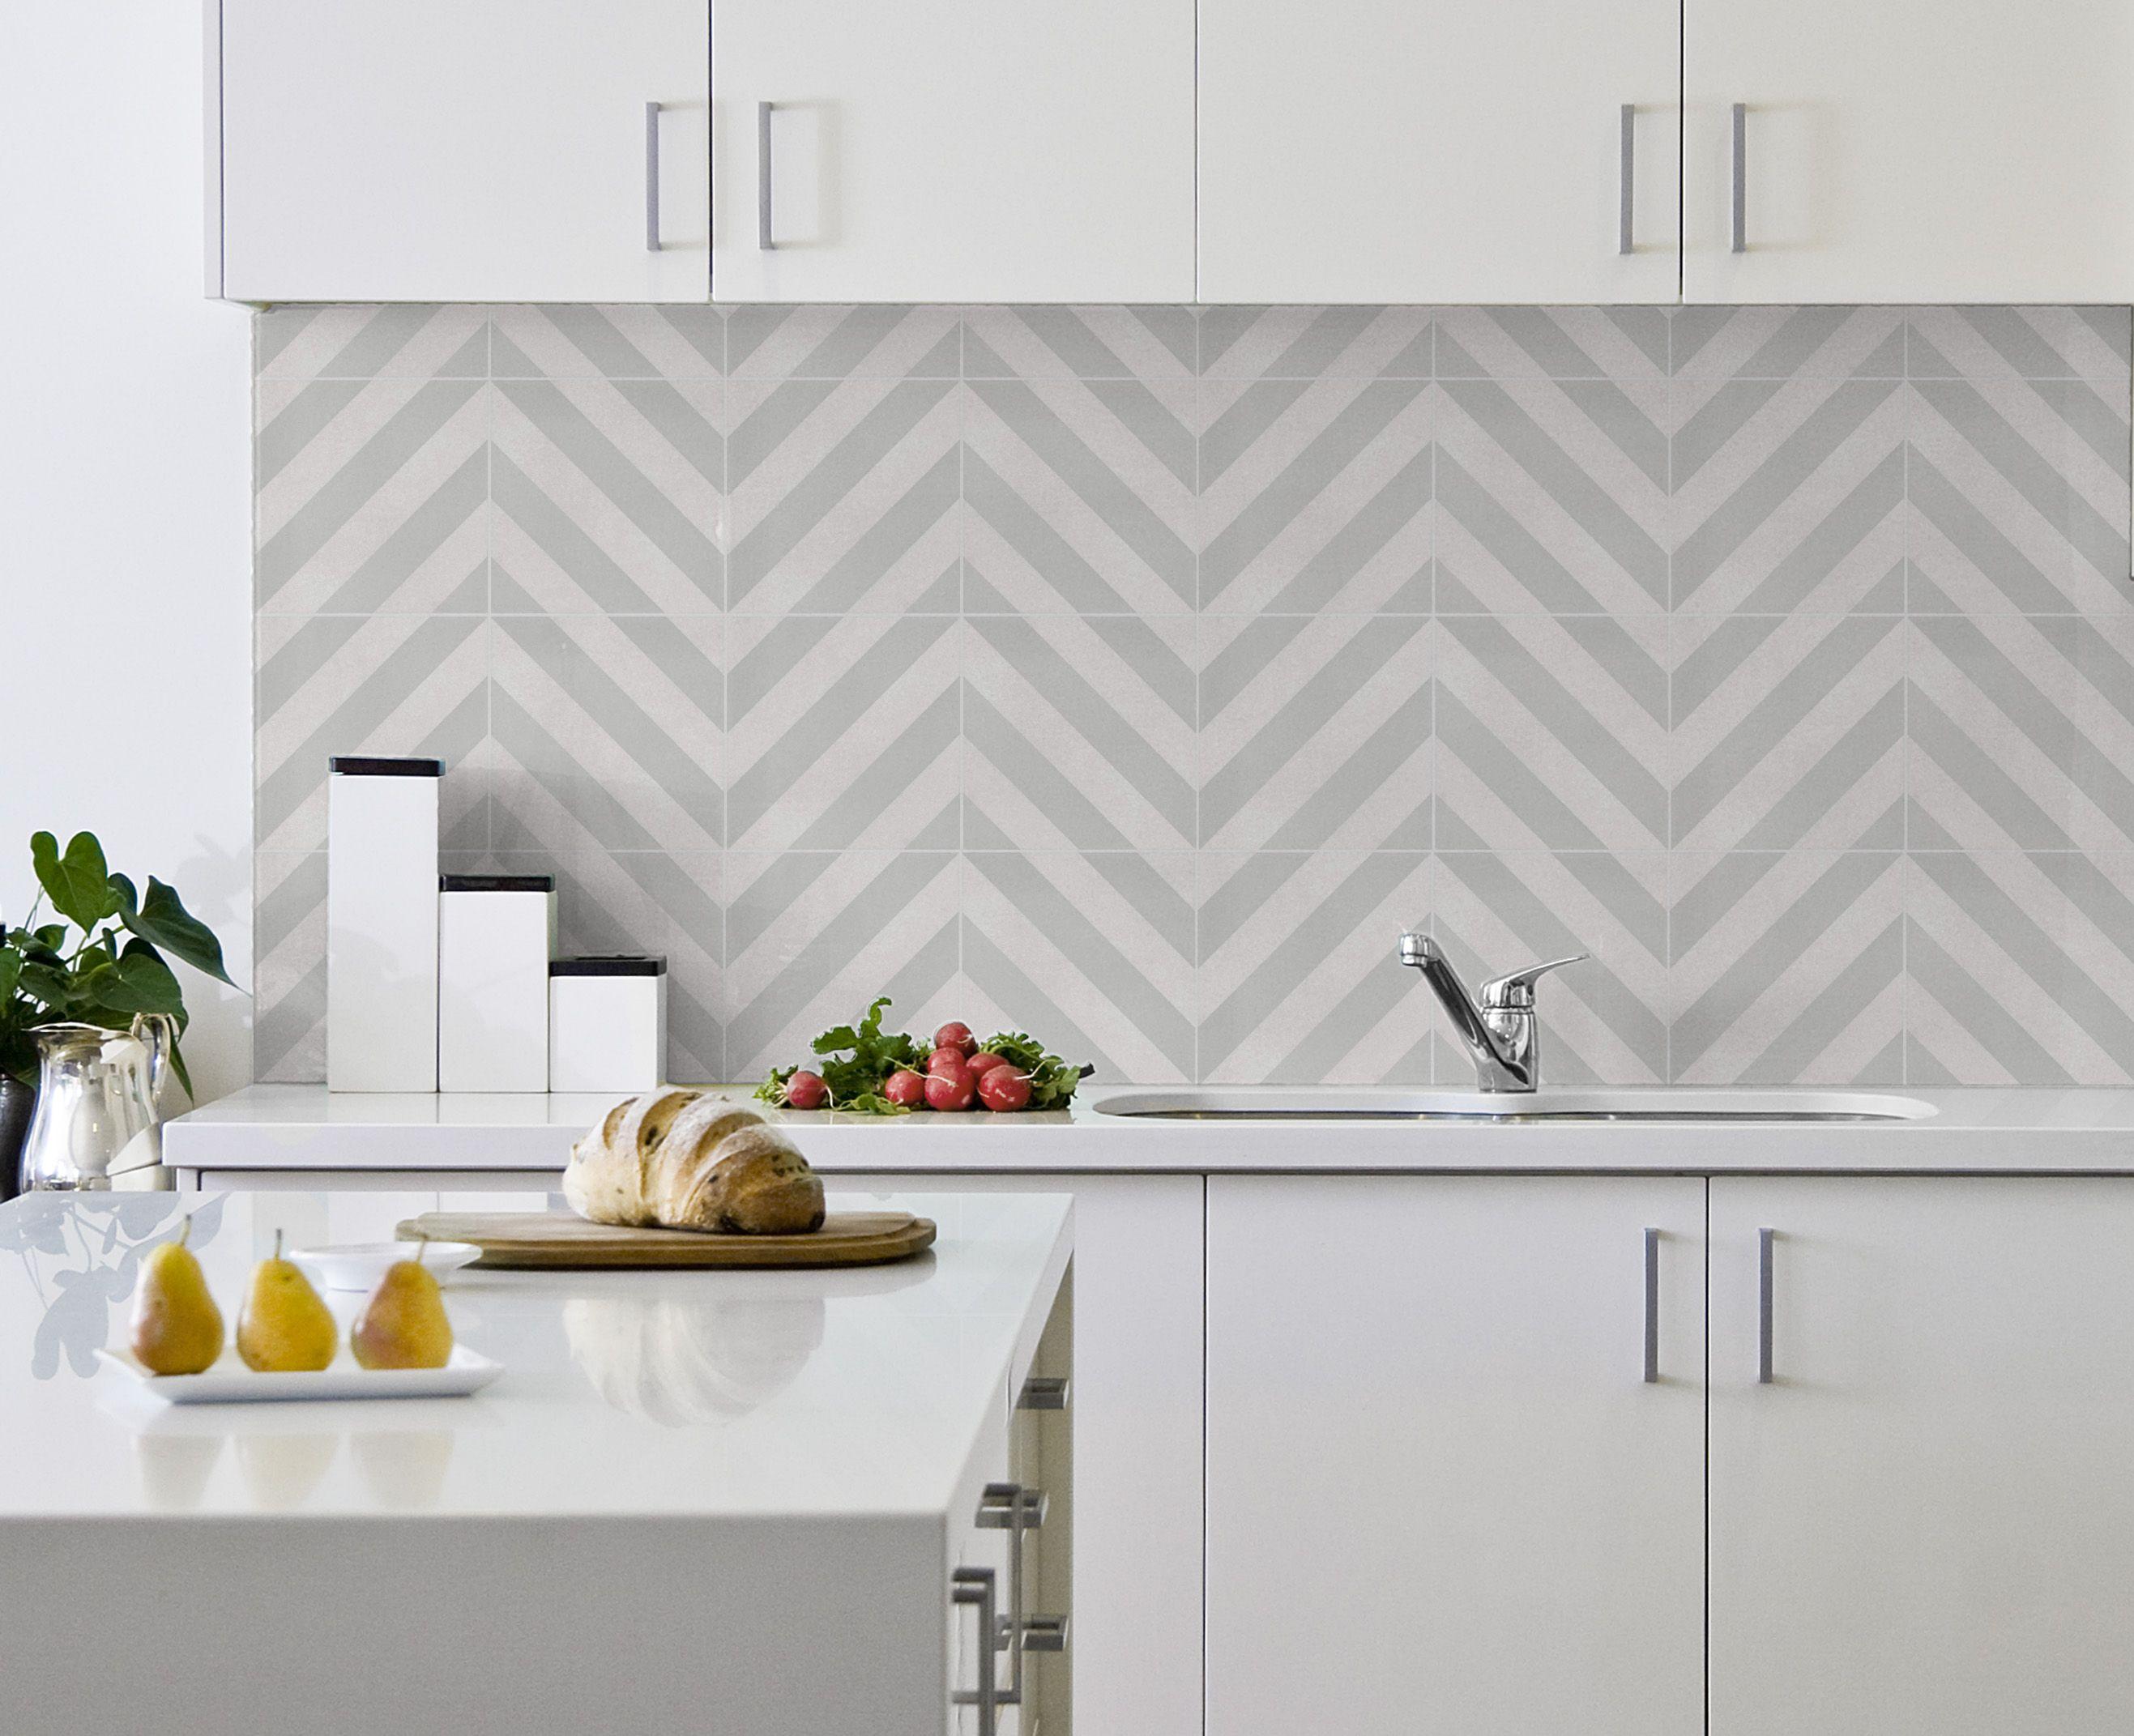 Patterned Tiles For Kitchen 33 Best Images About Splash Backs On Pinterest Chevron Tile